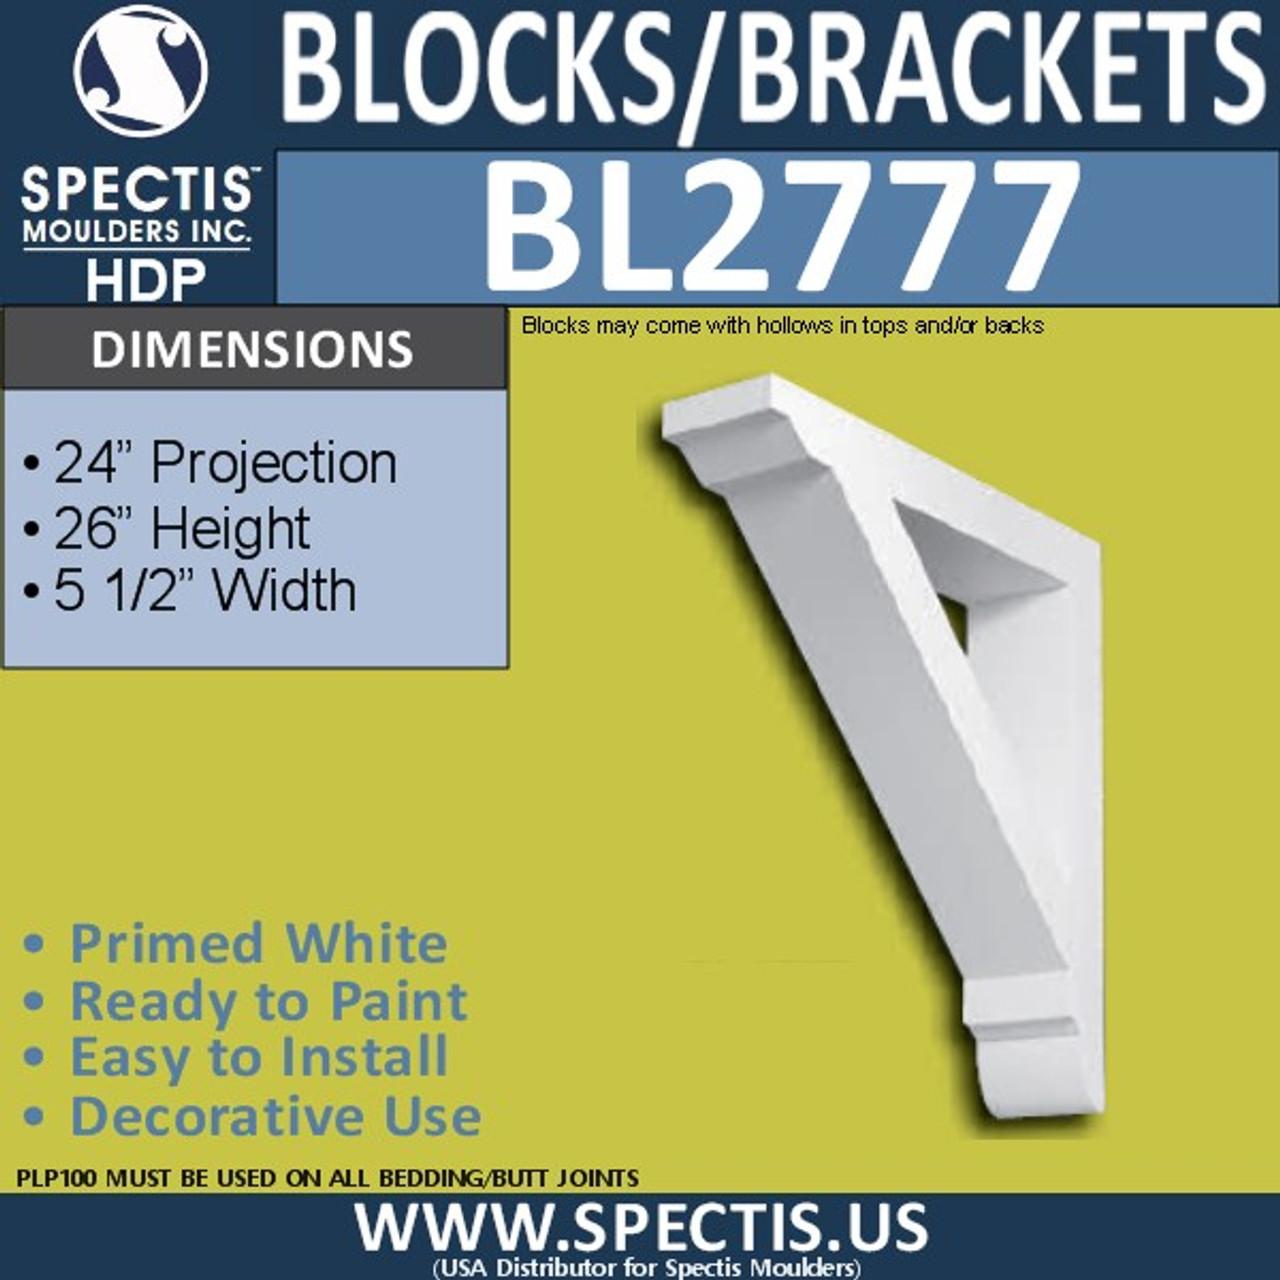 "BL2777 Eave Block or Bracket 5.5""W x 26""H x 24"" P"